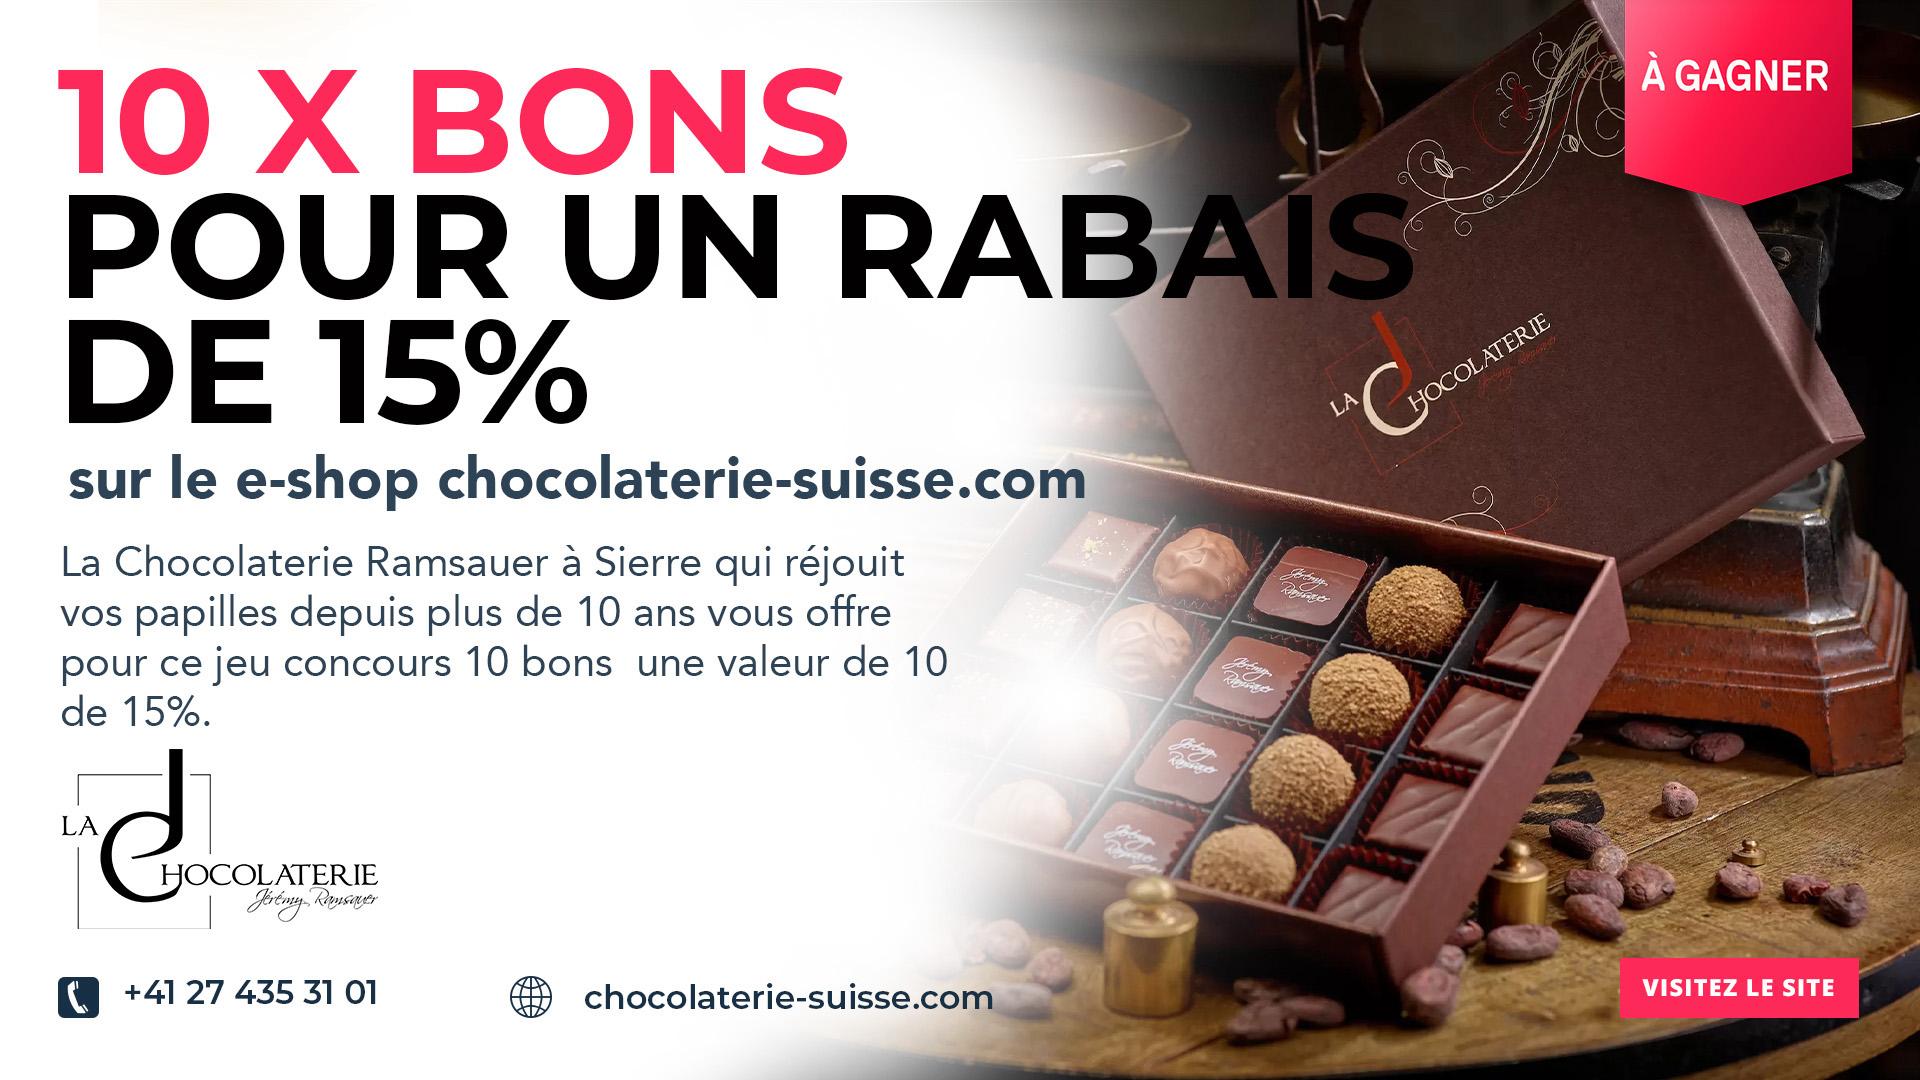 La Chocolaterie Ramsauer